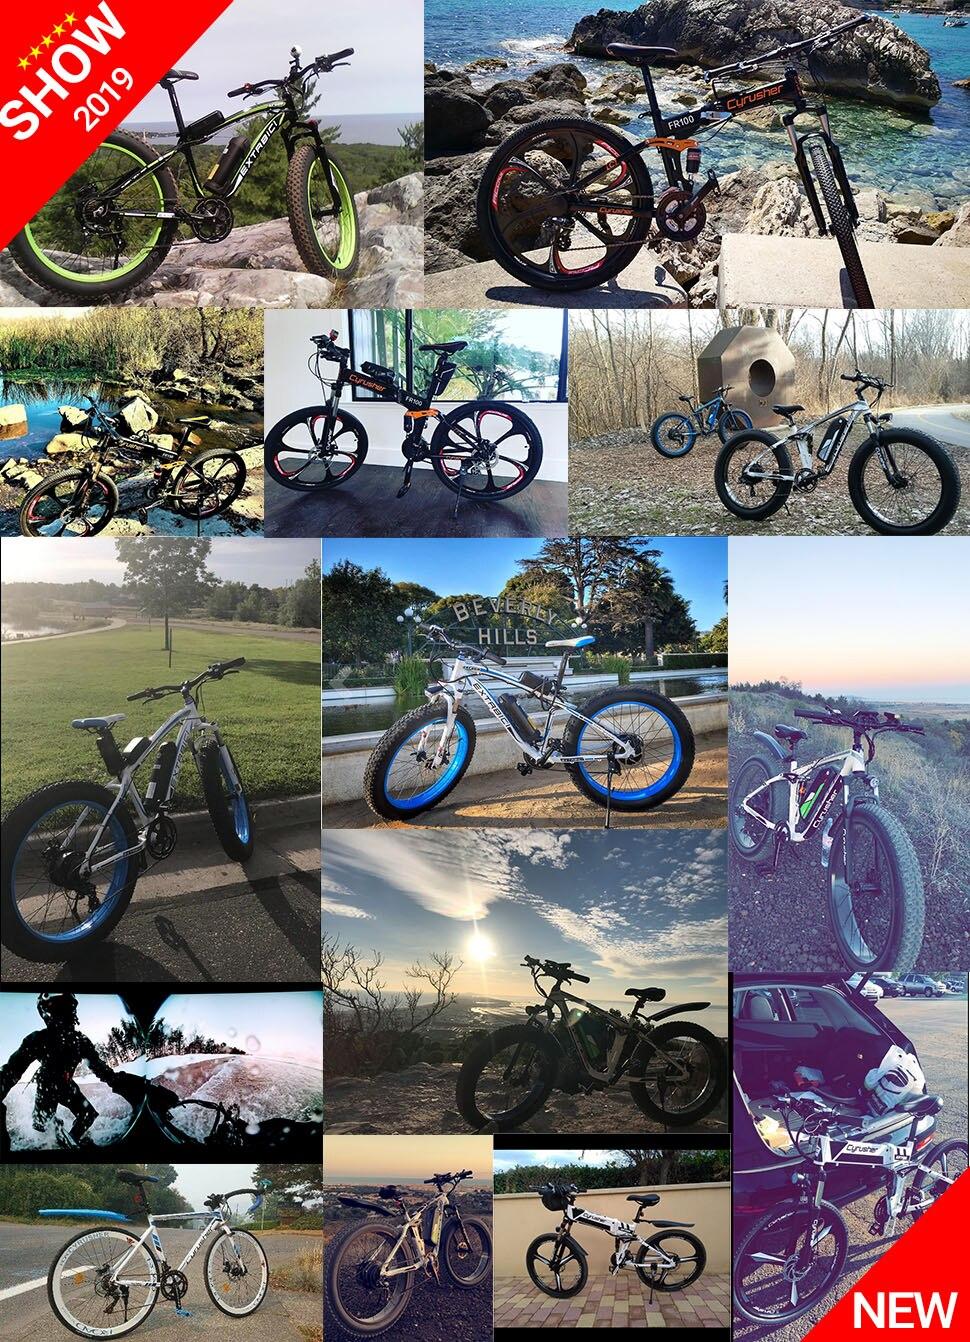 HTB1cwZzM4TpK1RjSZR0q6zEwXXav - Cyrusher XF800 1000W 48V Electrical Bike Full Suspension body 7 Speeds widewheel highway Bike out of doors sensible speedometer Ebike